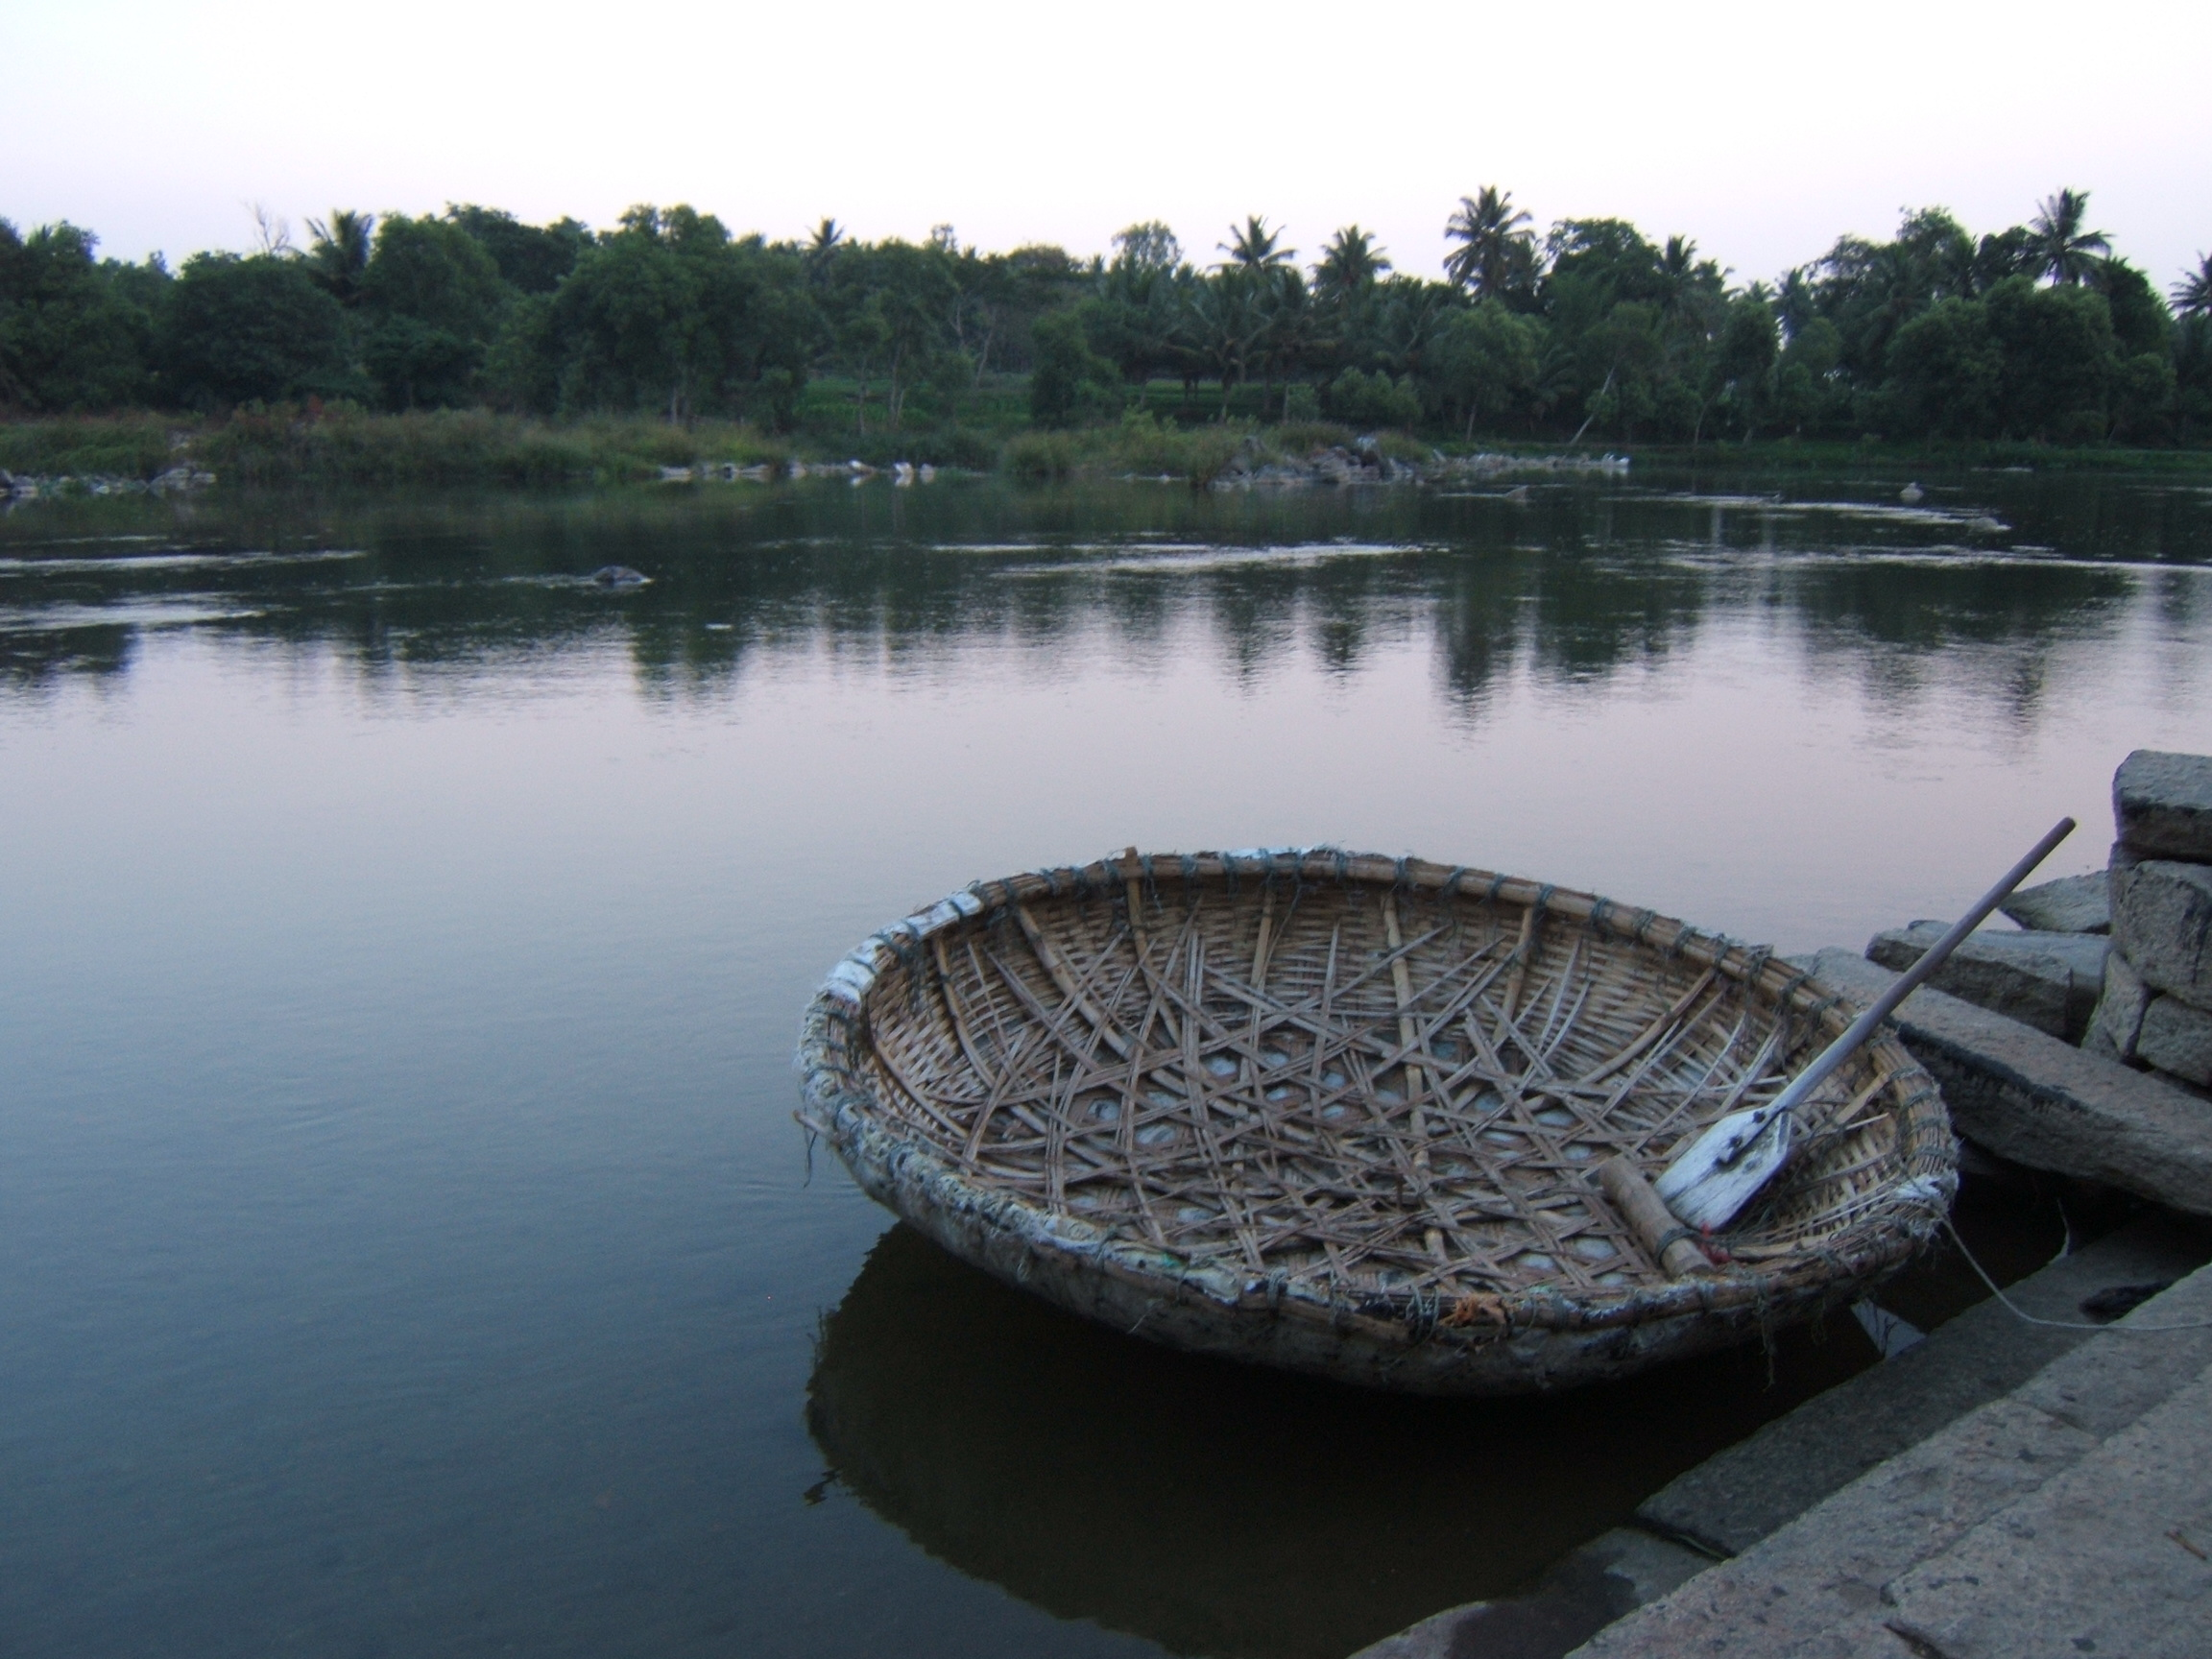 Kaveri River Description Boat at Kaveri river at Shrirangapatnam JPG